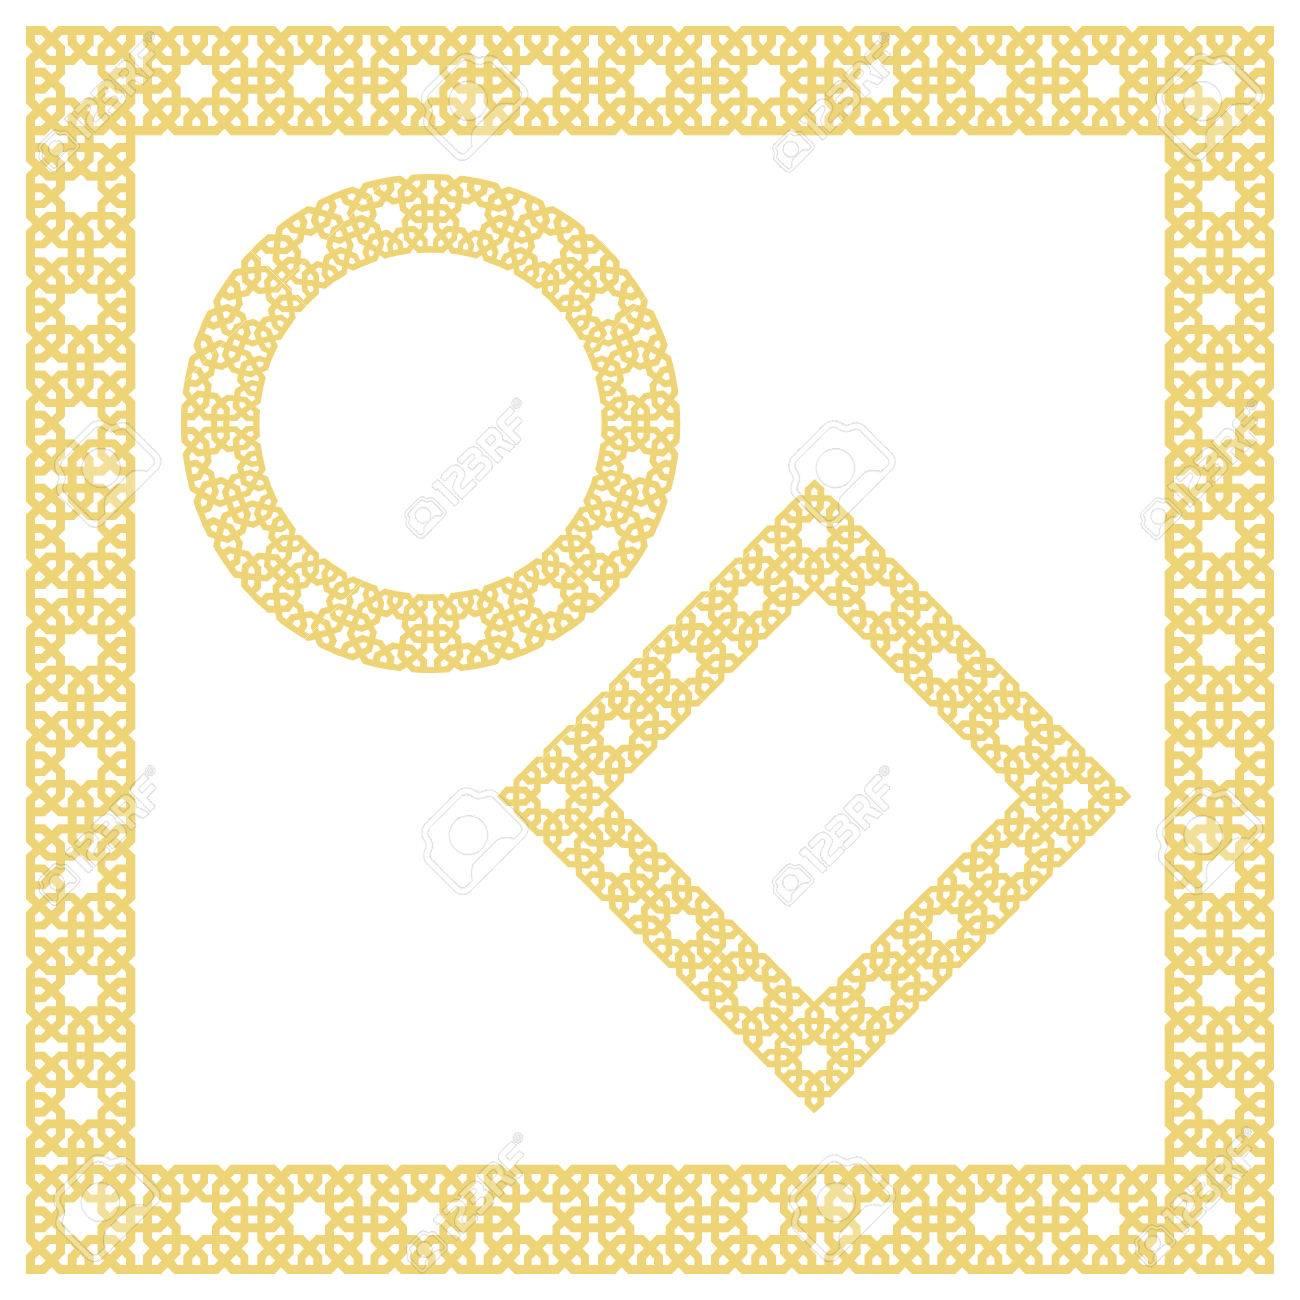 Islamic Geometric Borders, Frames, Vignettes. Vector Muslim ...